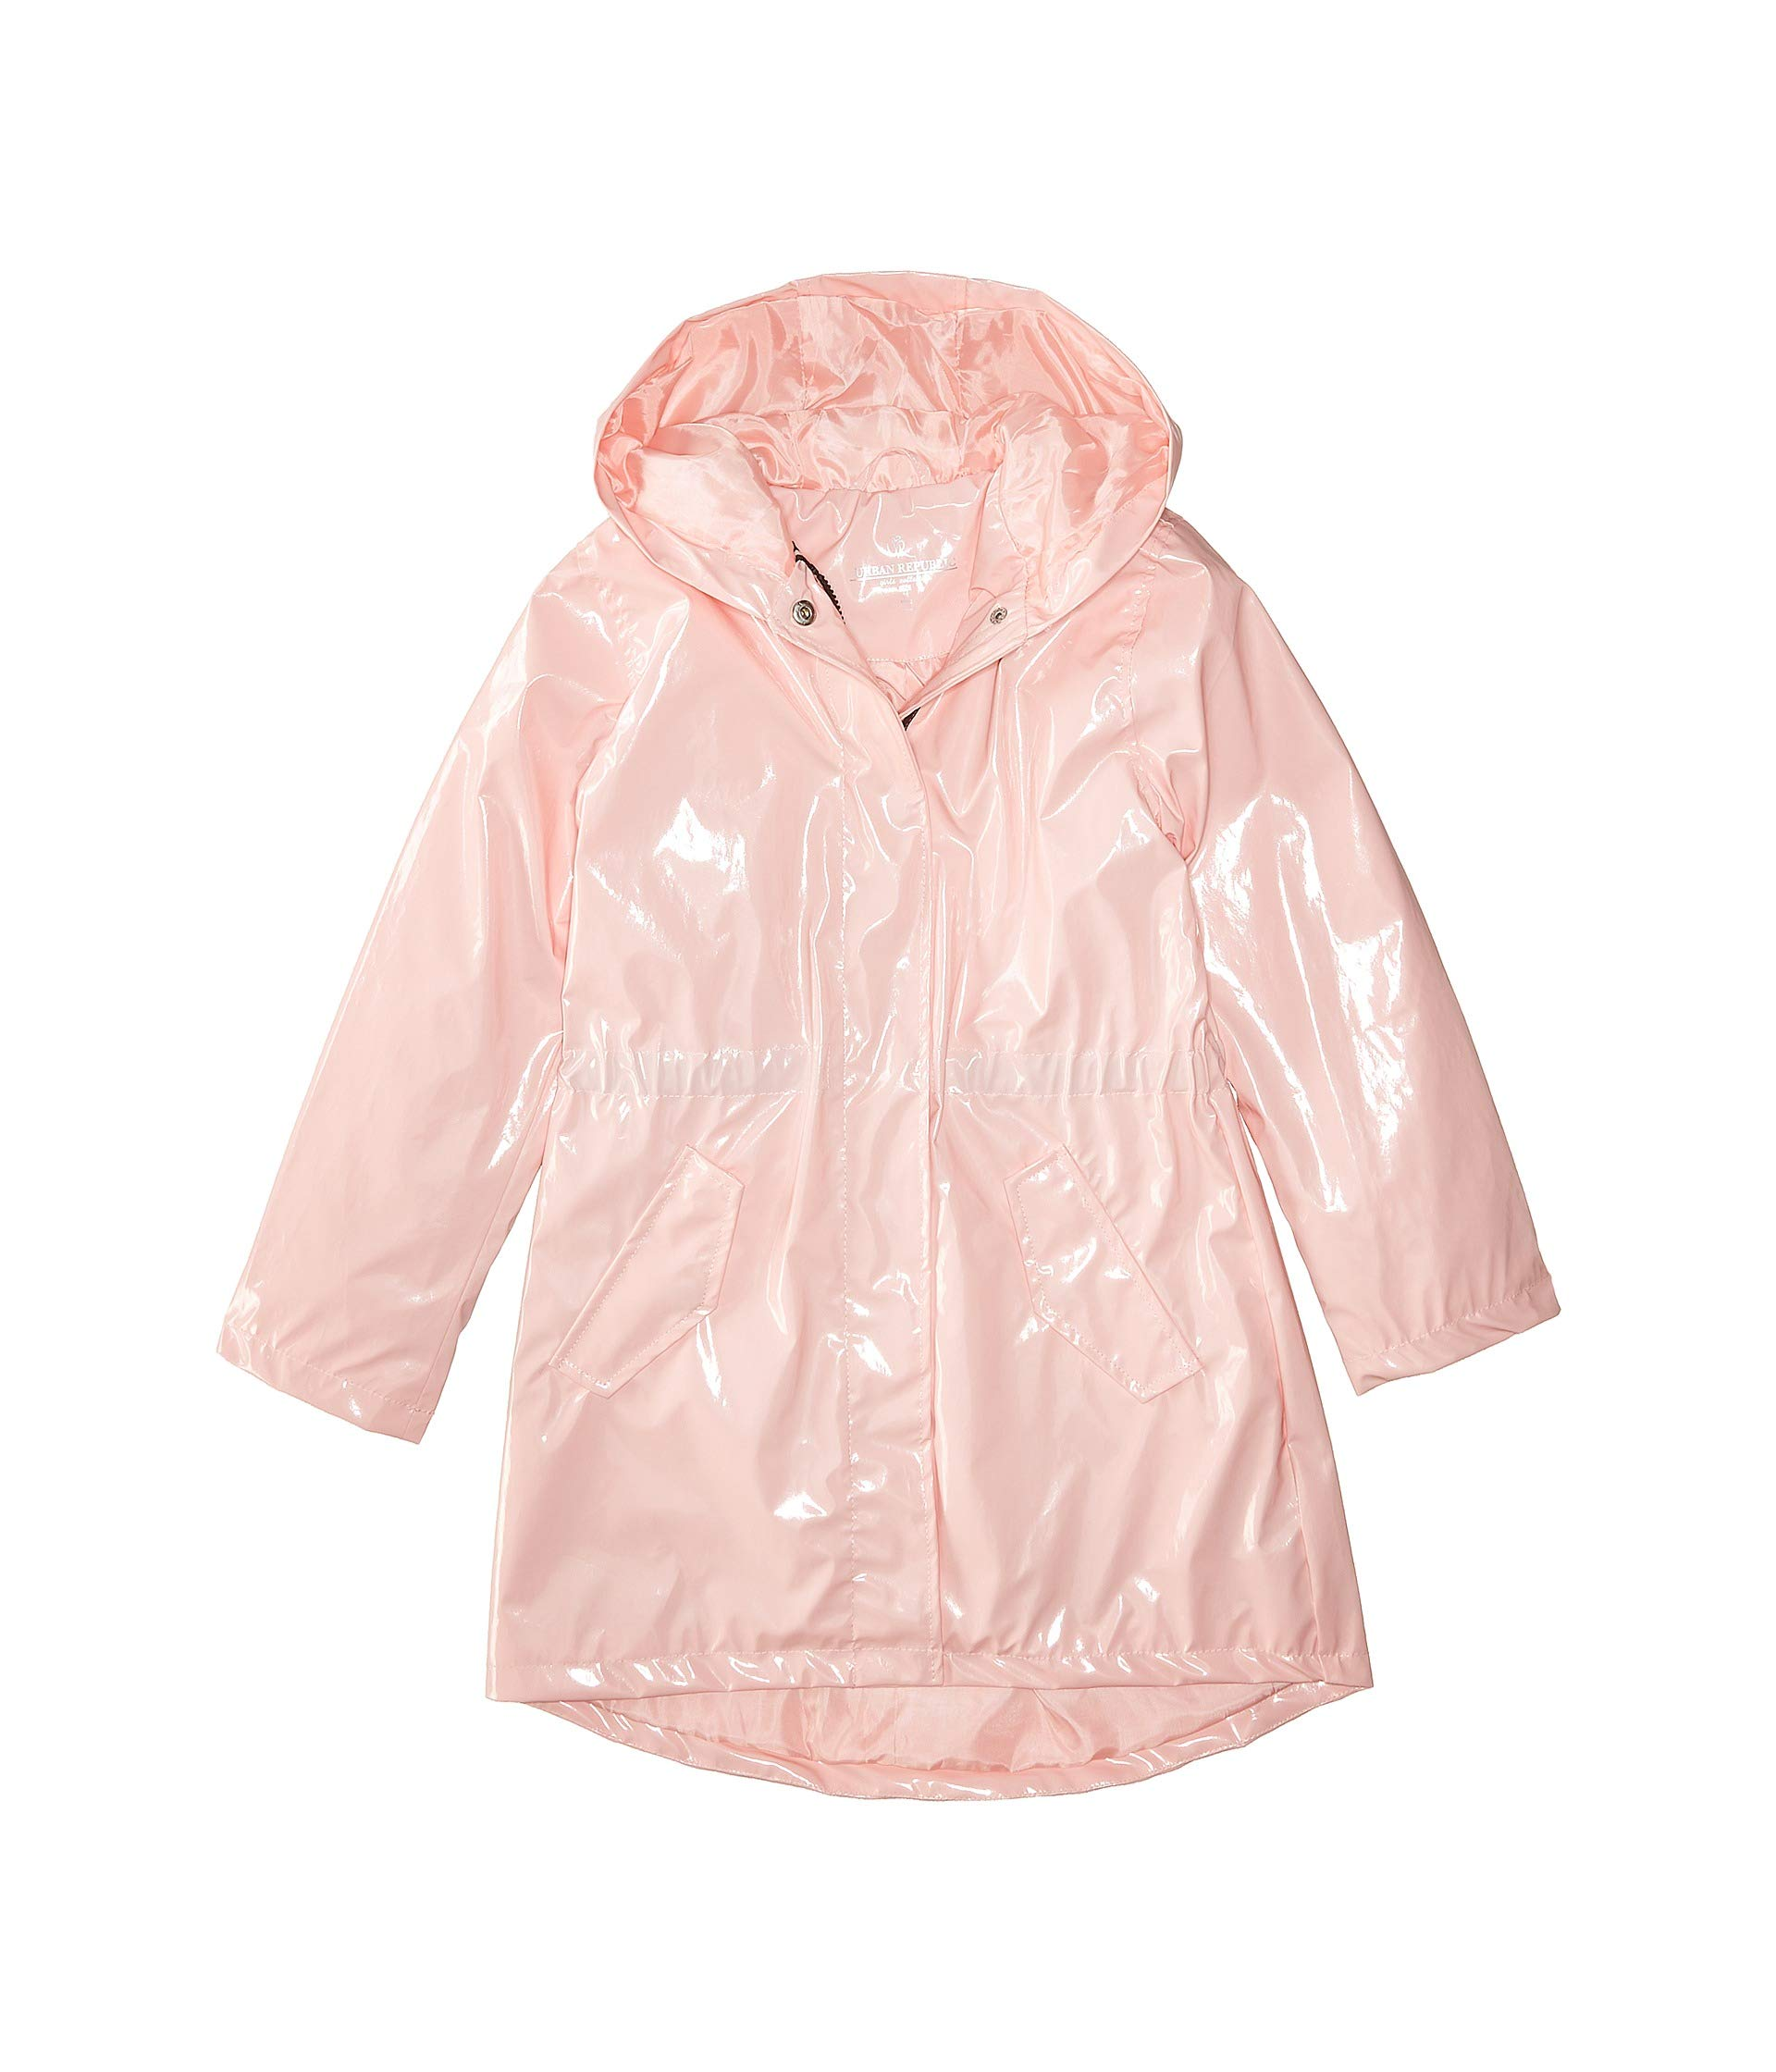 Urban Republic Kids Girl's Raincoat Patent Faux Leather Anorak Jacket (Little Kids/Big Kids)